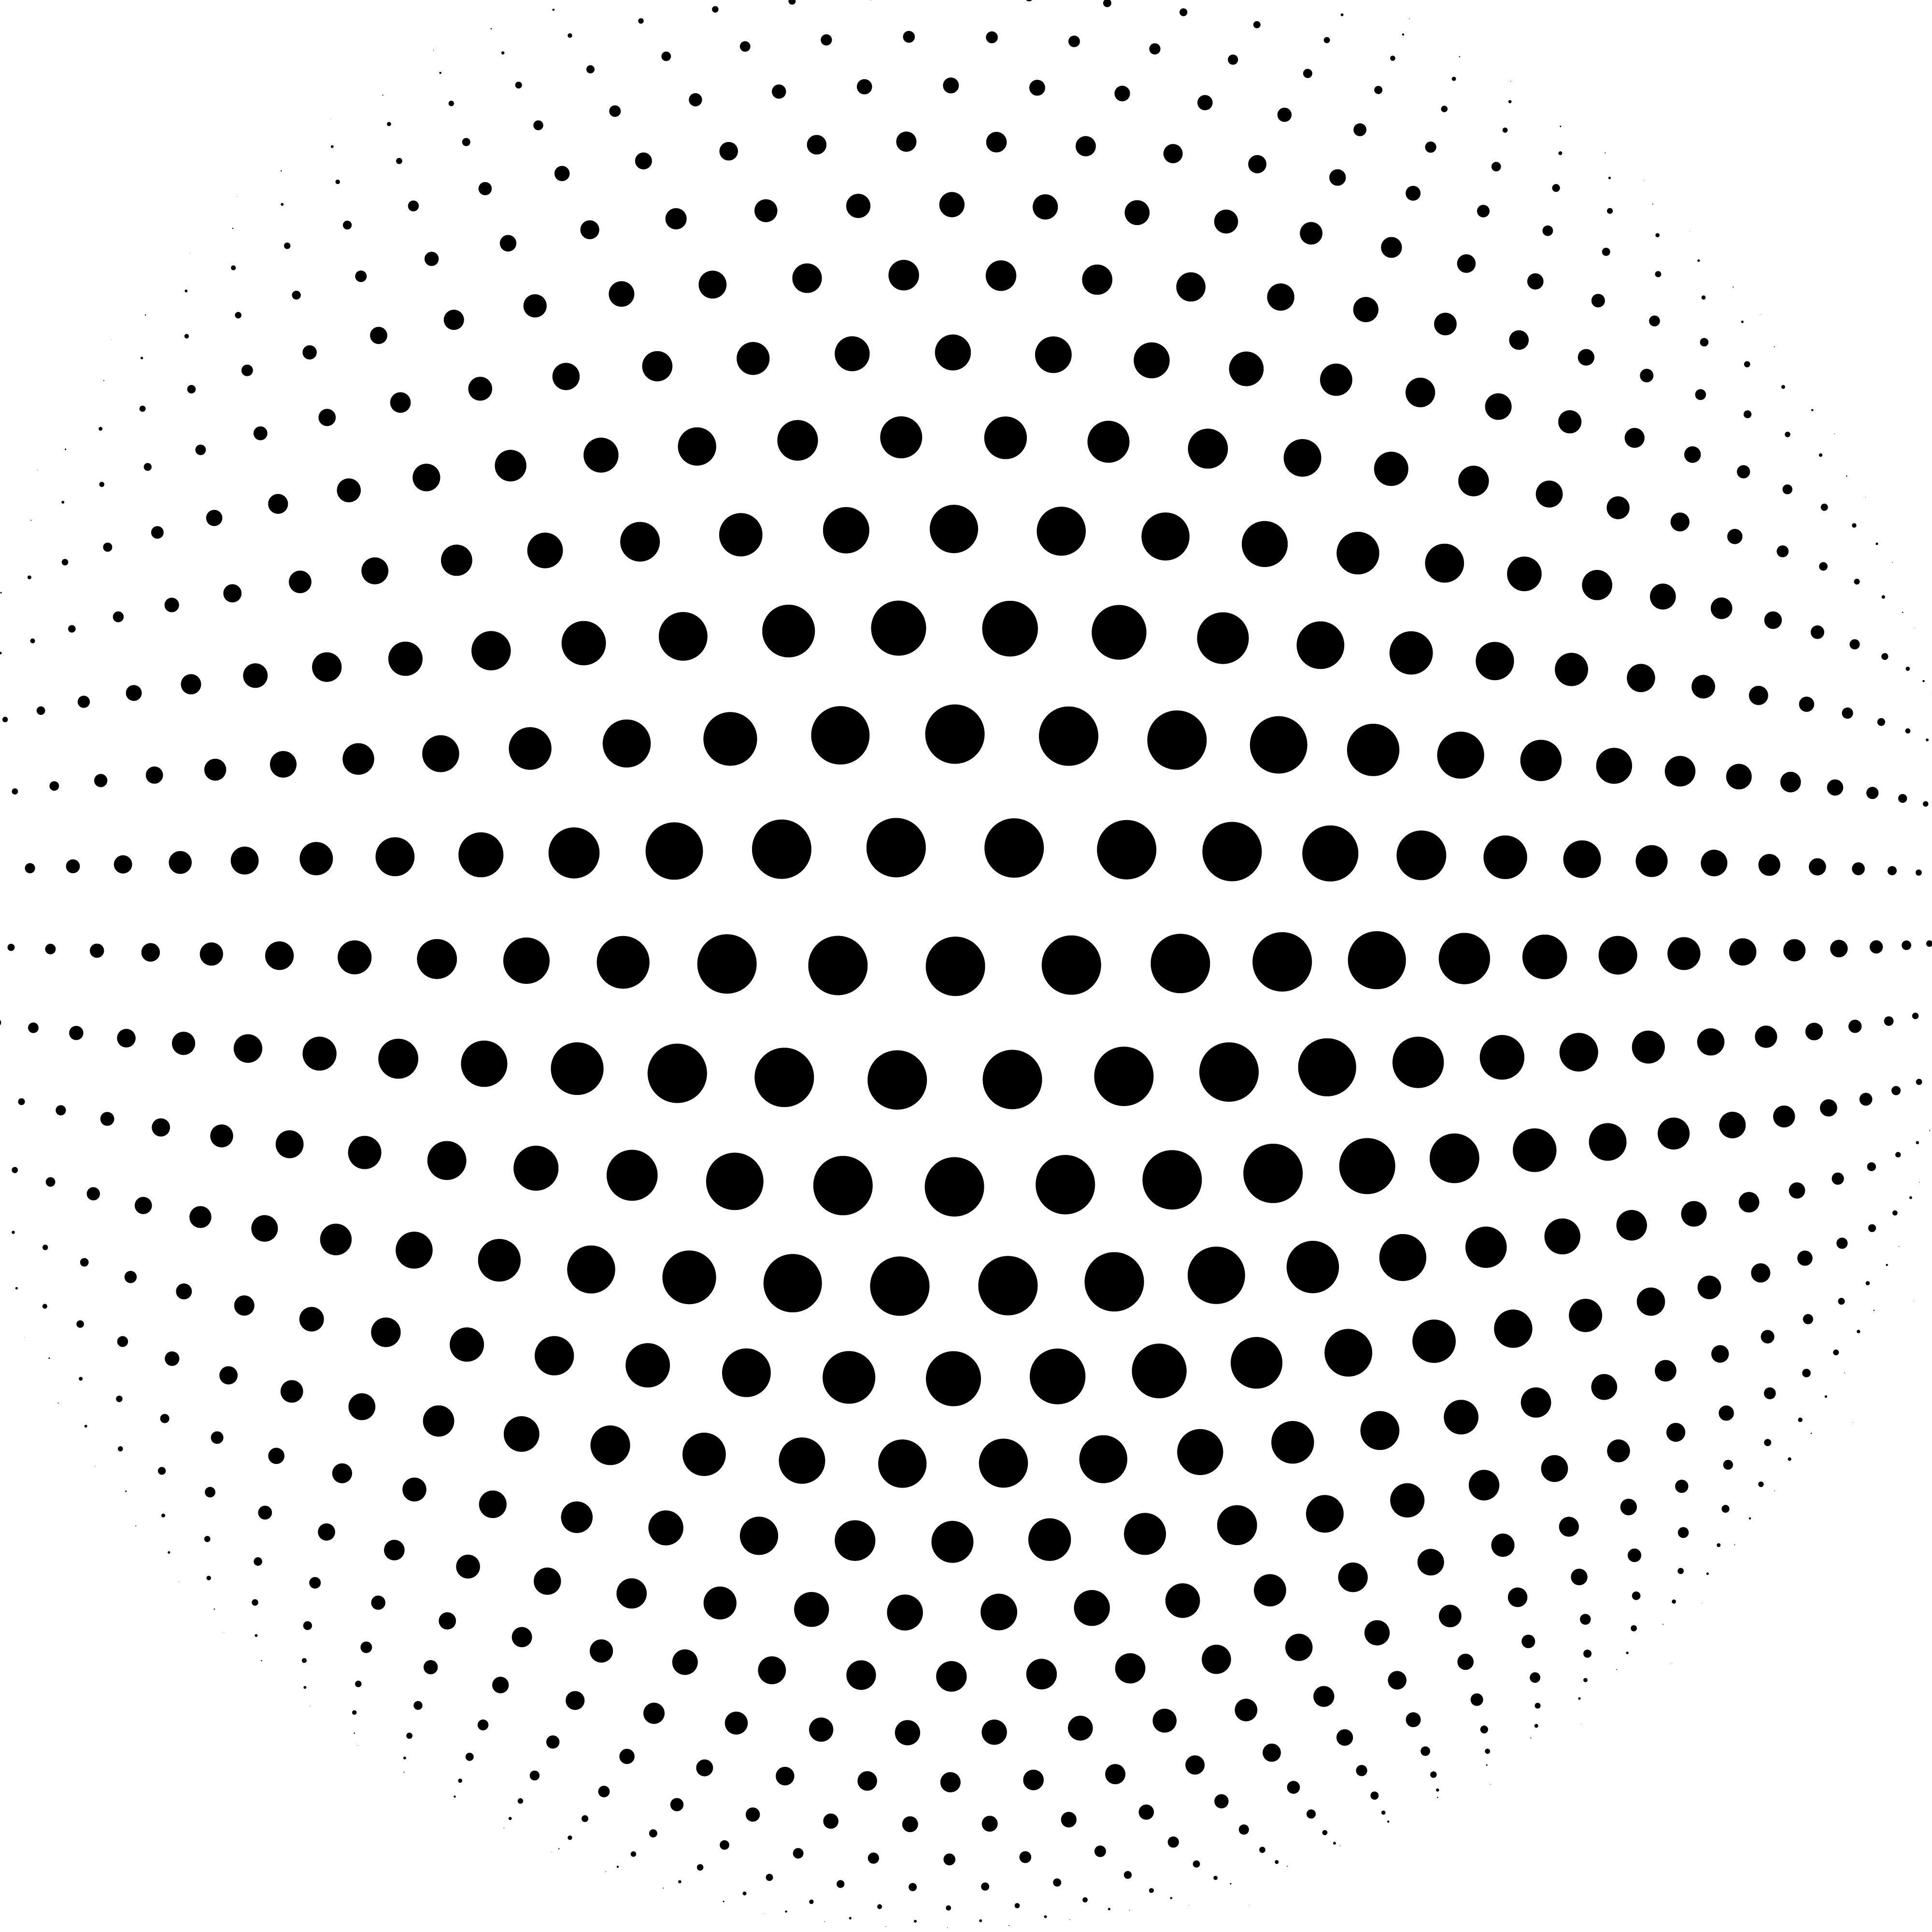 Halftone Sphere Free Vector Art 2360 Free Downloads Vector Art Design Dot Pattern Vector Geometric Sleeve Tattoo